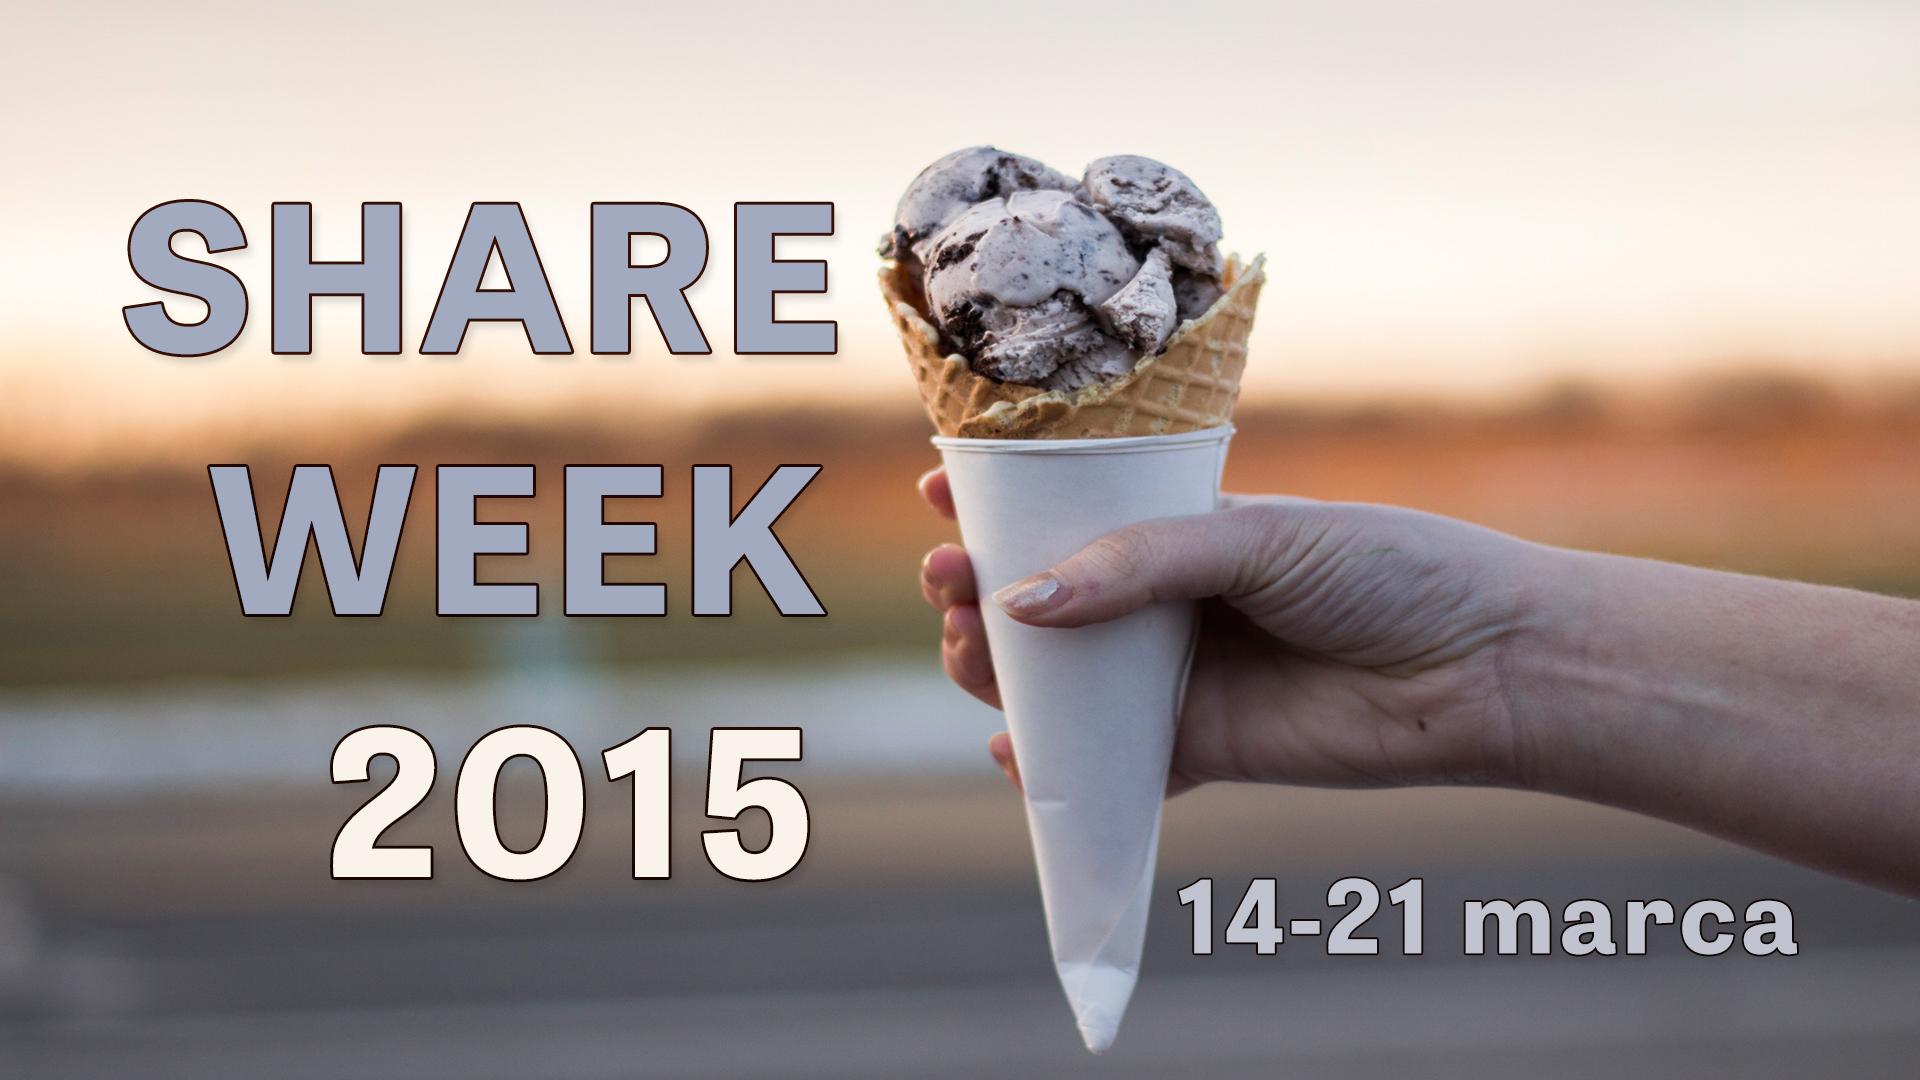 Polecamy najlepsze blogi - SHARE WEEK 2015